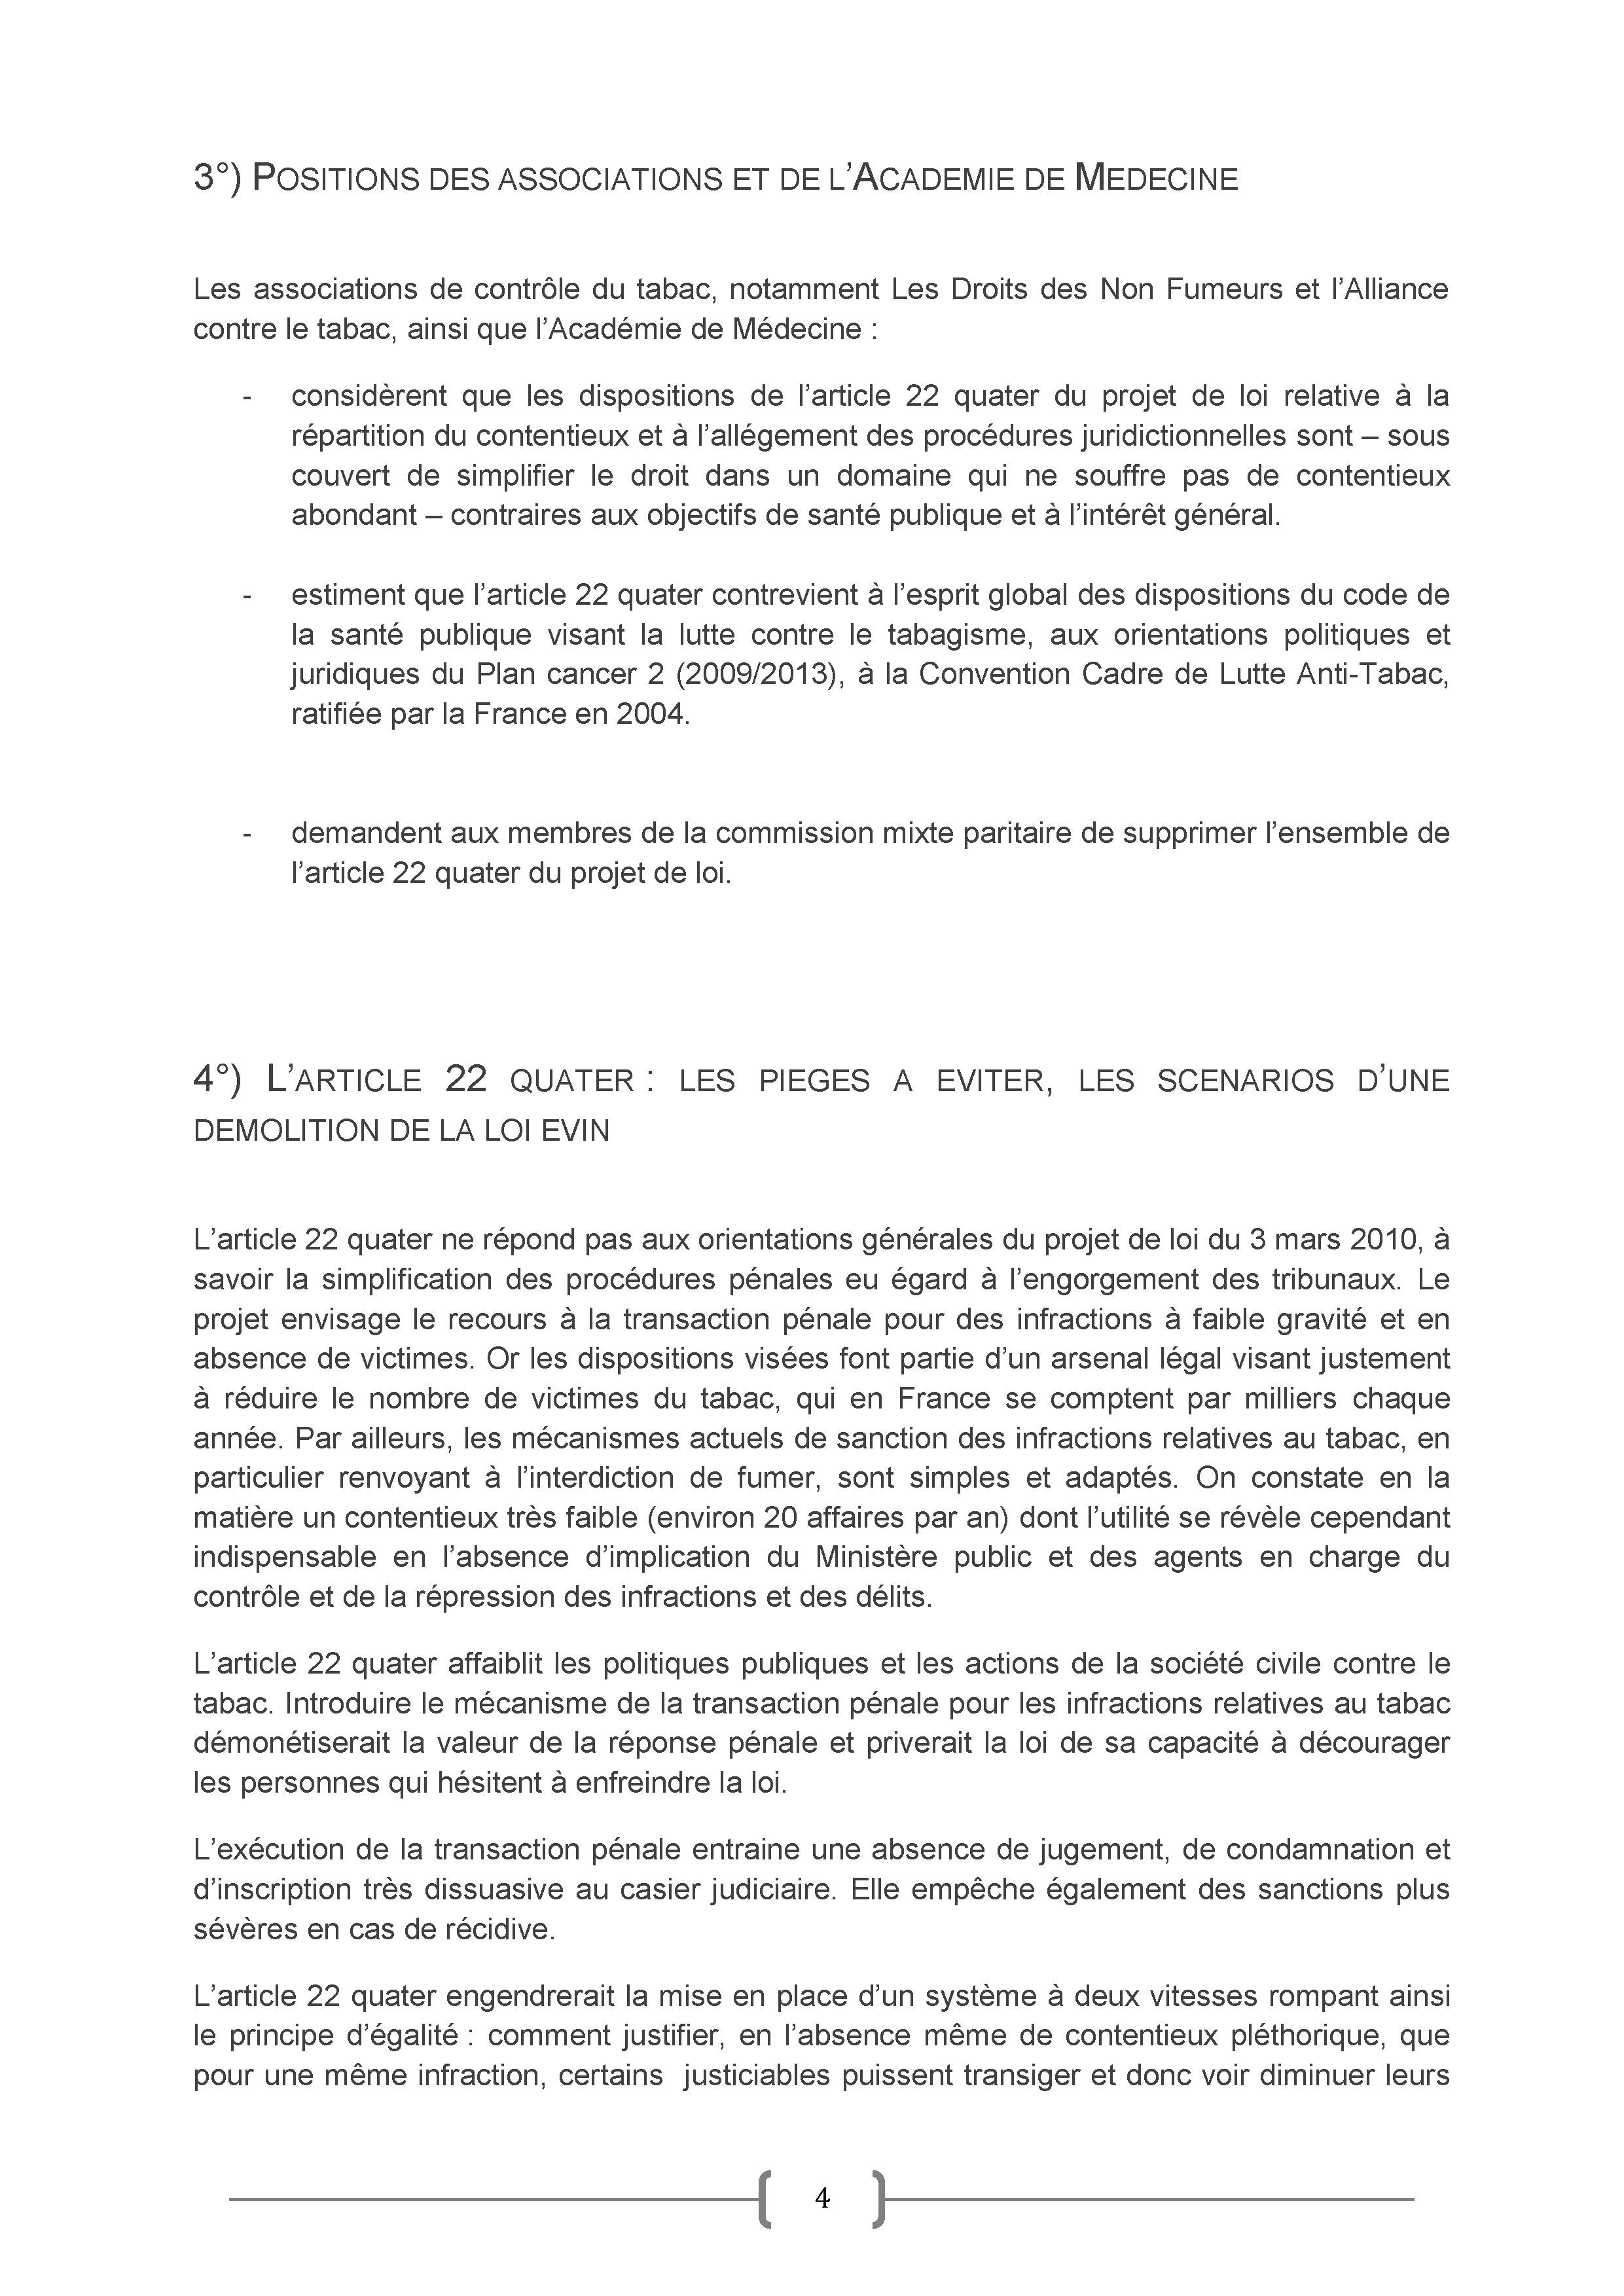 Alliance-DP_projet-loi-article-22-quater_05juil2011_Page_4.jpg